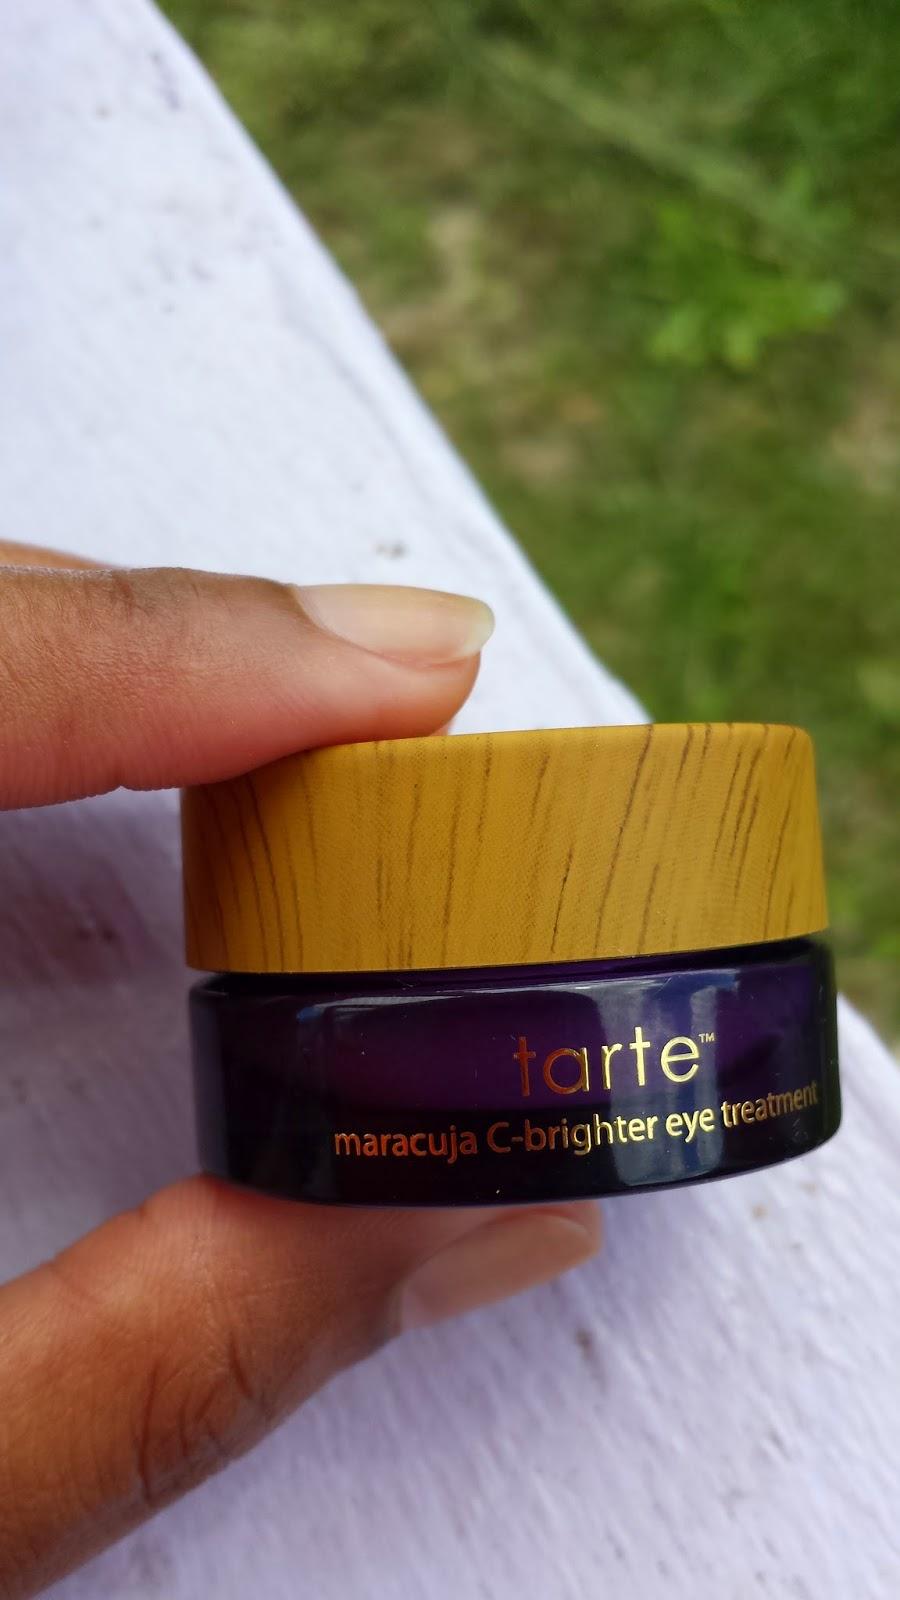 Tarte Maracuja C-Brighter Eye Treatment - www.modenmakeup.com